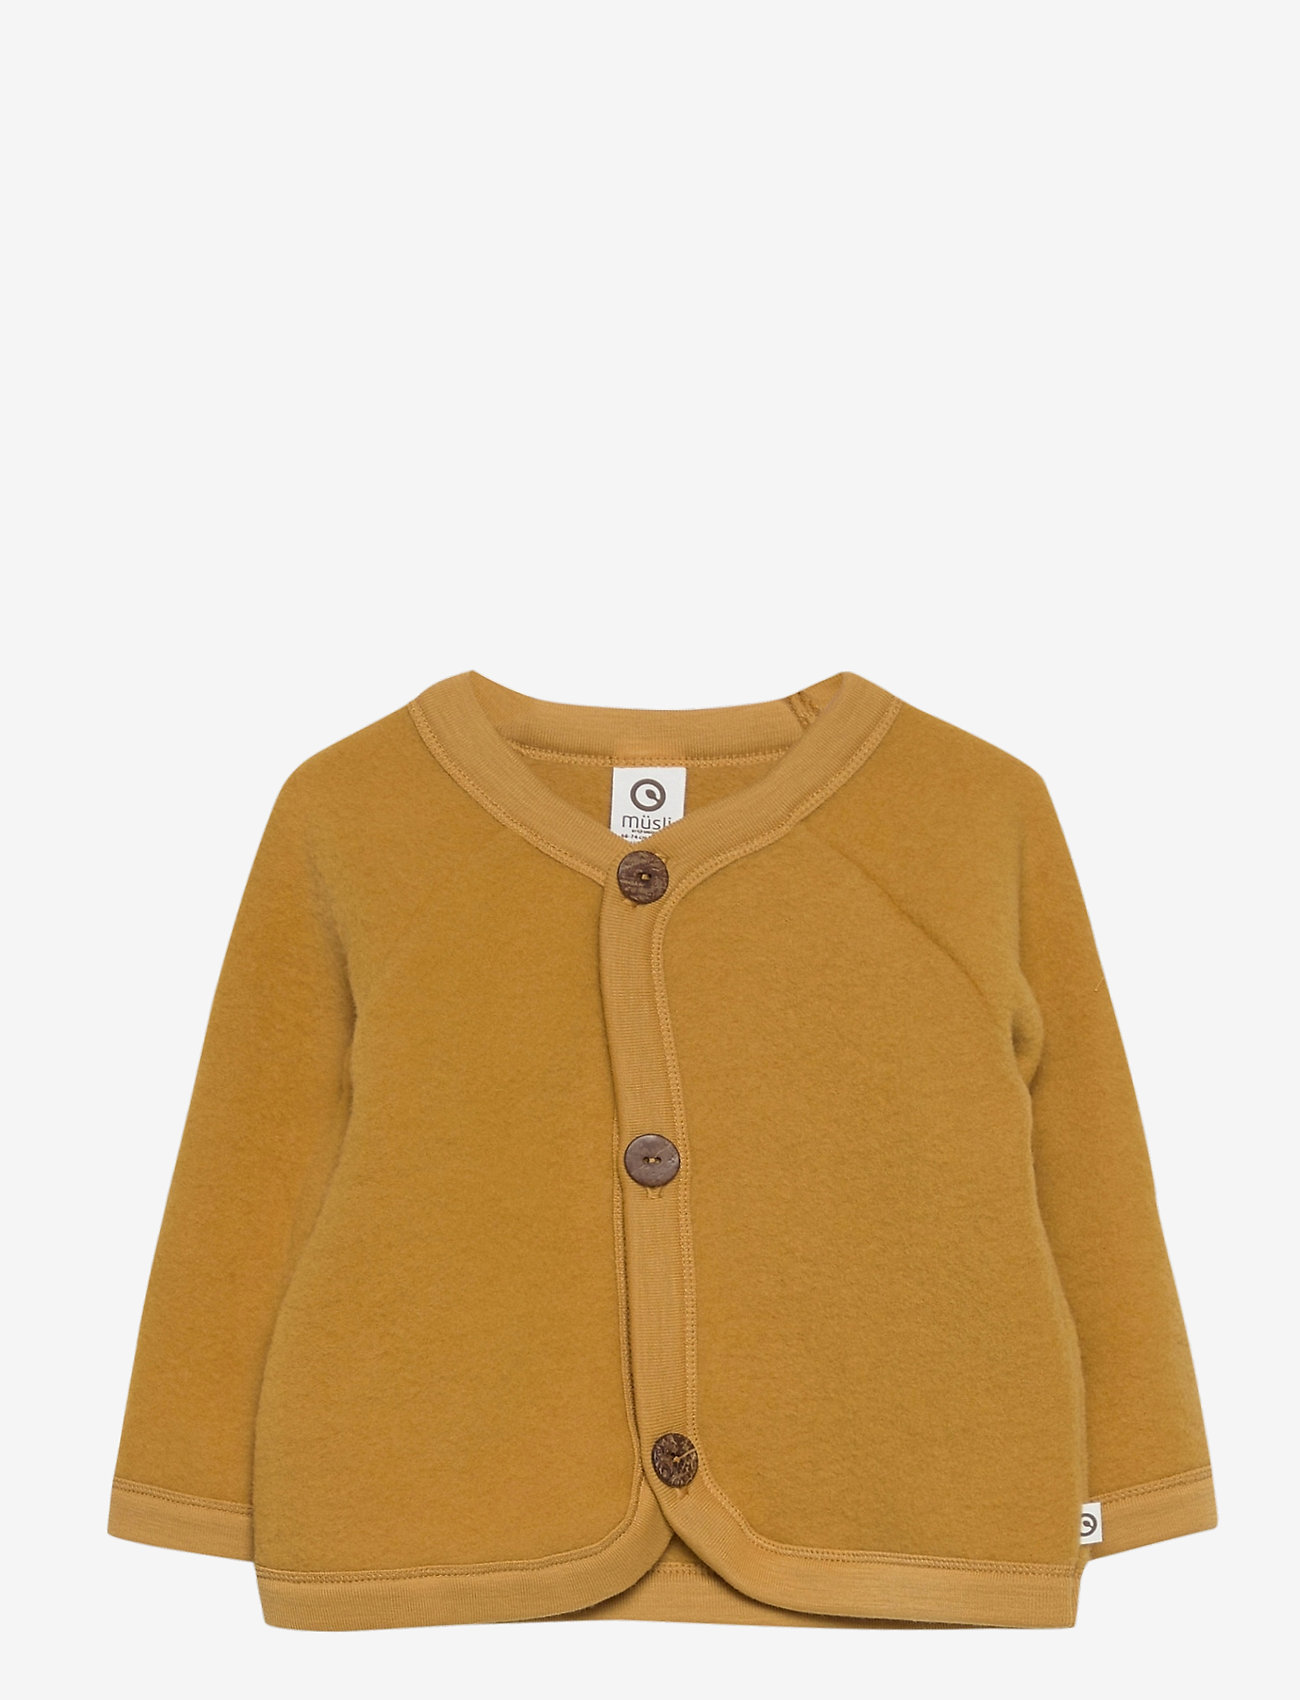 Müsli by Green Cotton - Woolly fleece jacket baby - gilets - wood - 0